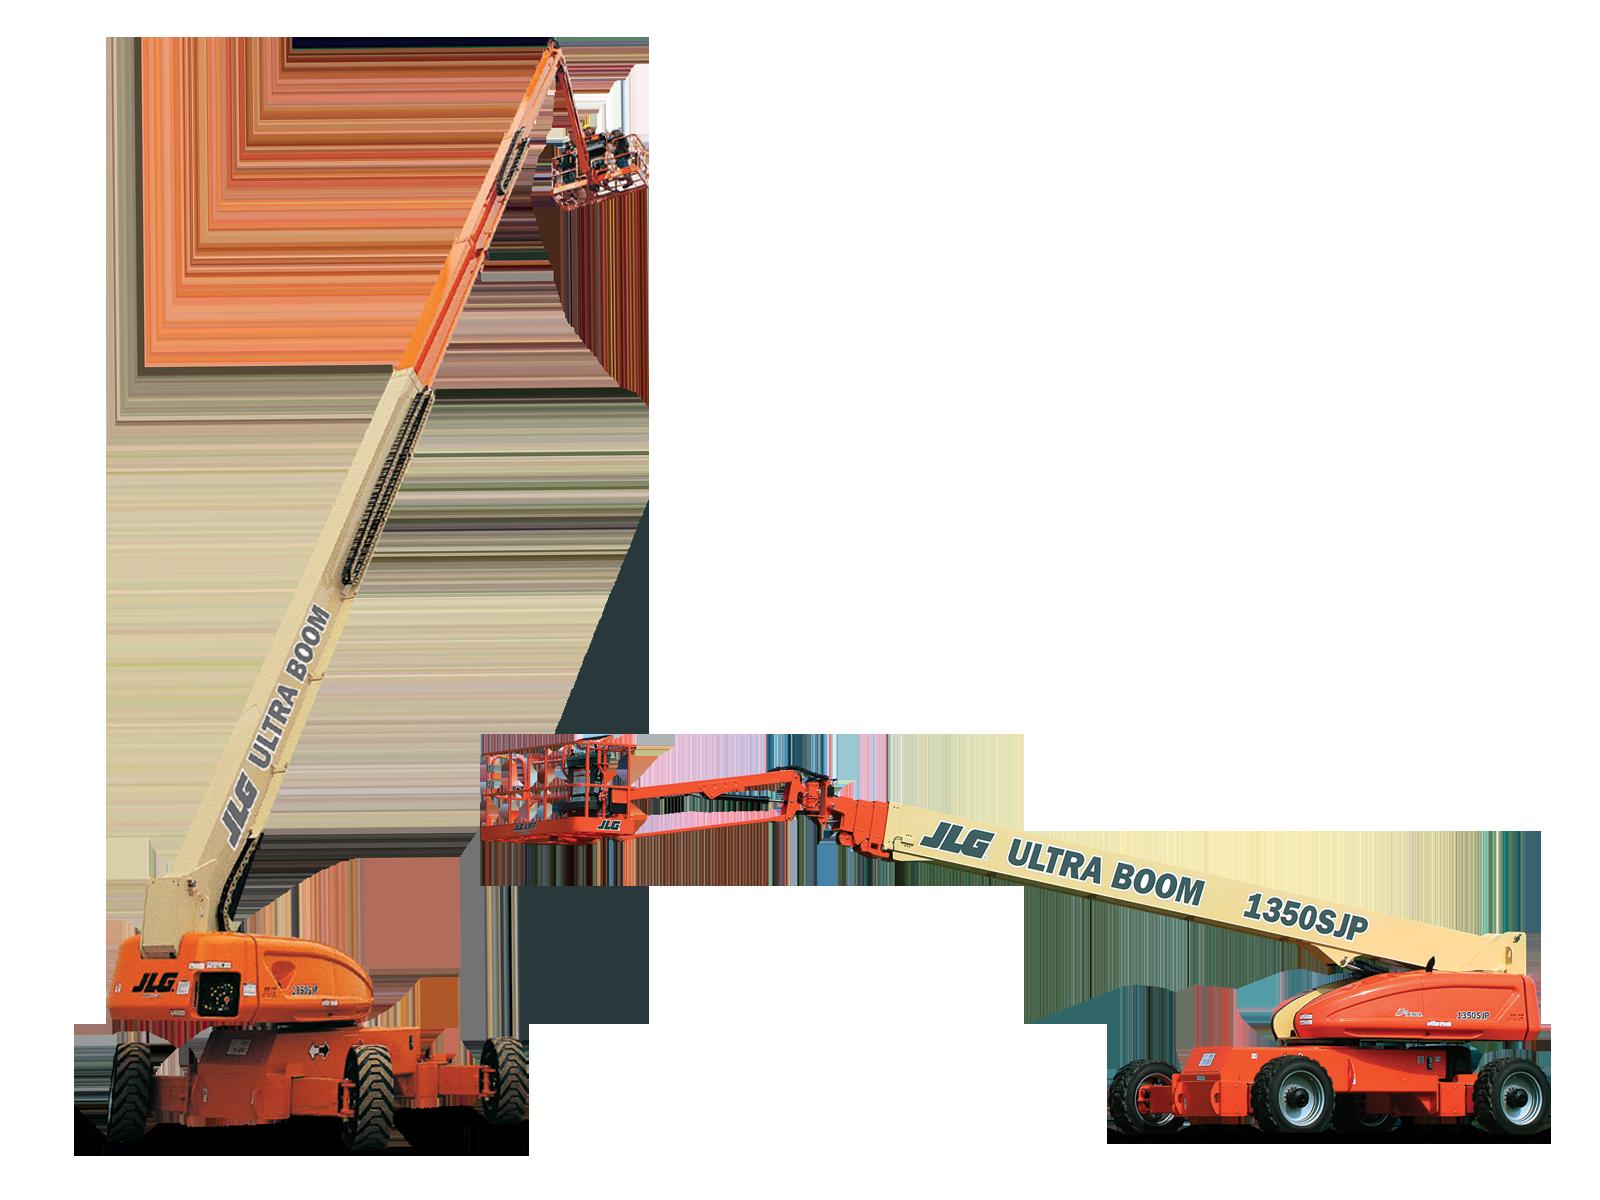 JLG 1350SJP